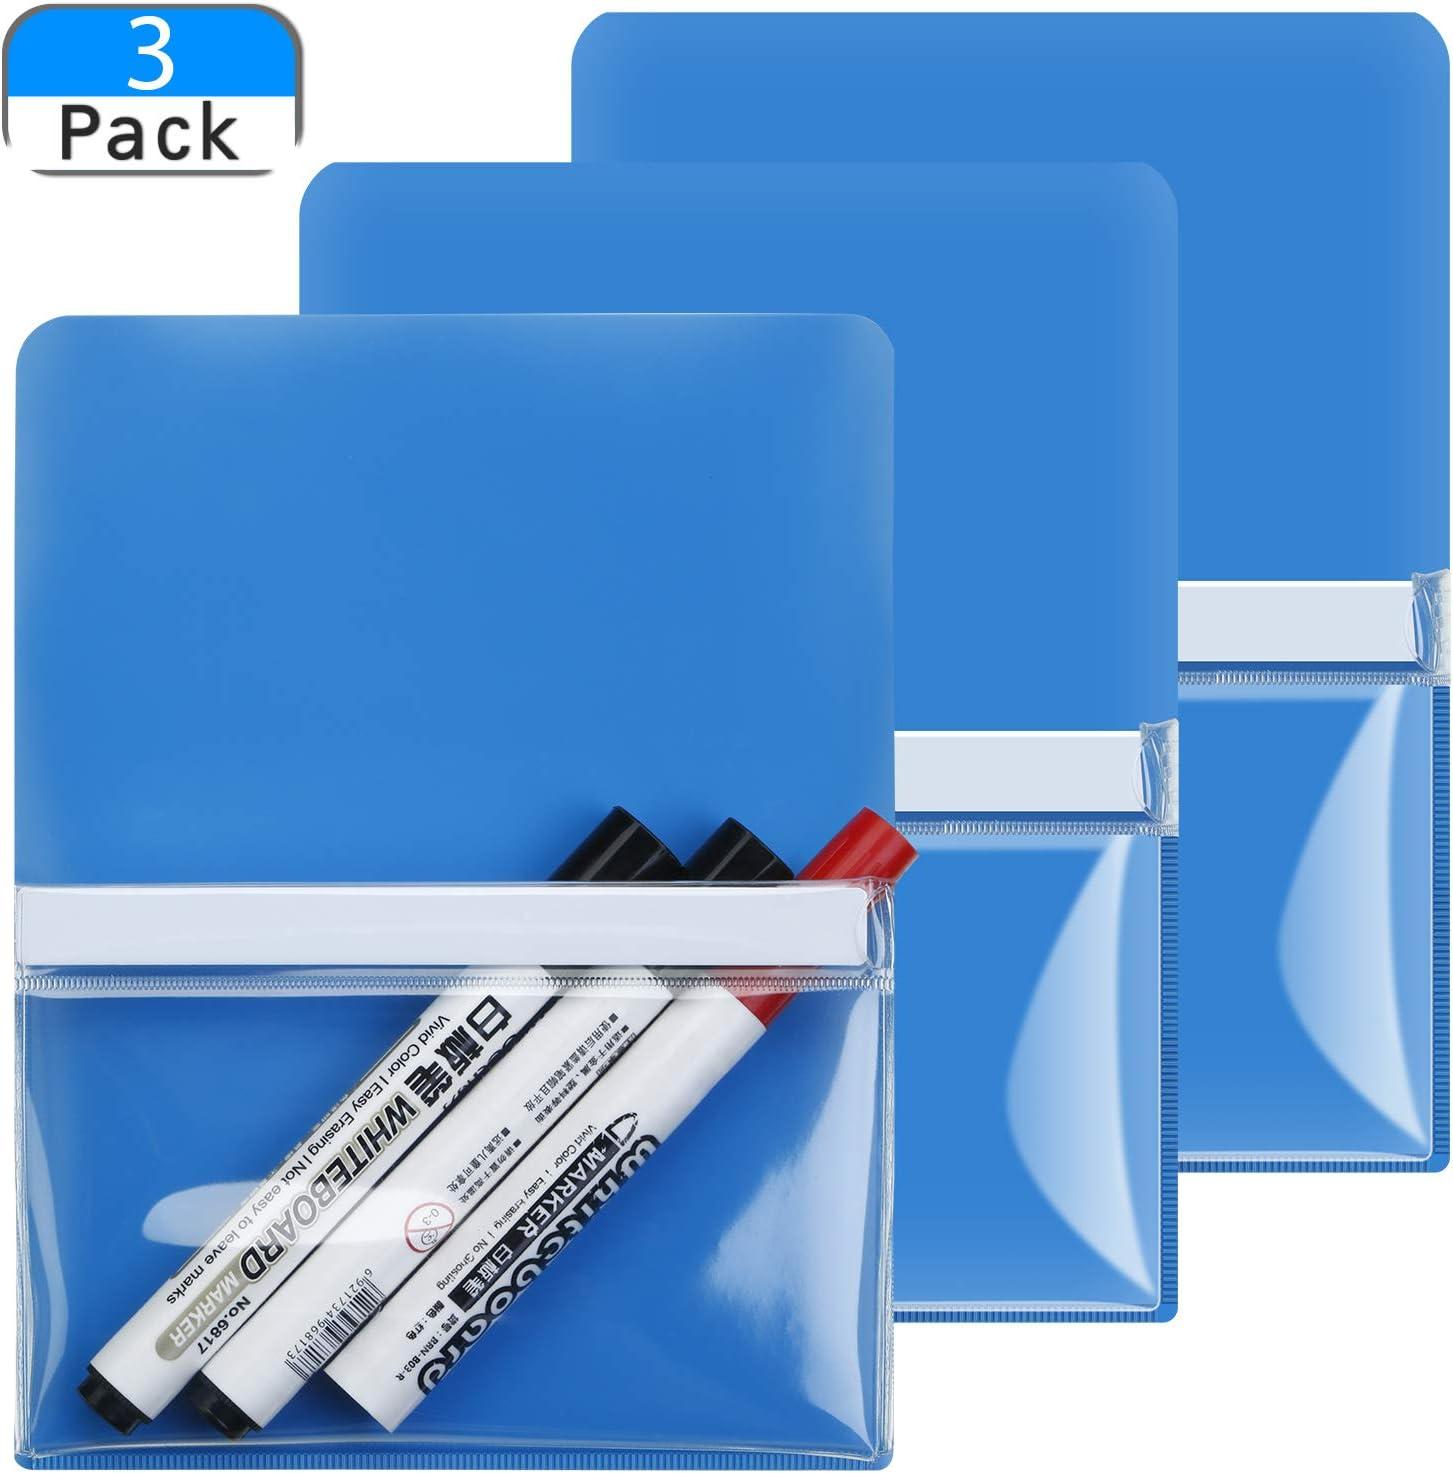 3 Pieces Magnetic Pen Holder Large Size Marker Holder Magnetic Marker Pocket Storage Holder for Refrigerator, Whiteboard, Fridge, Office Cabinet, Locker (Blue)